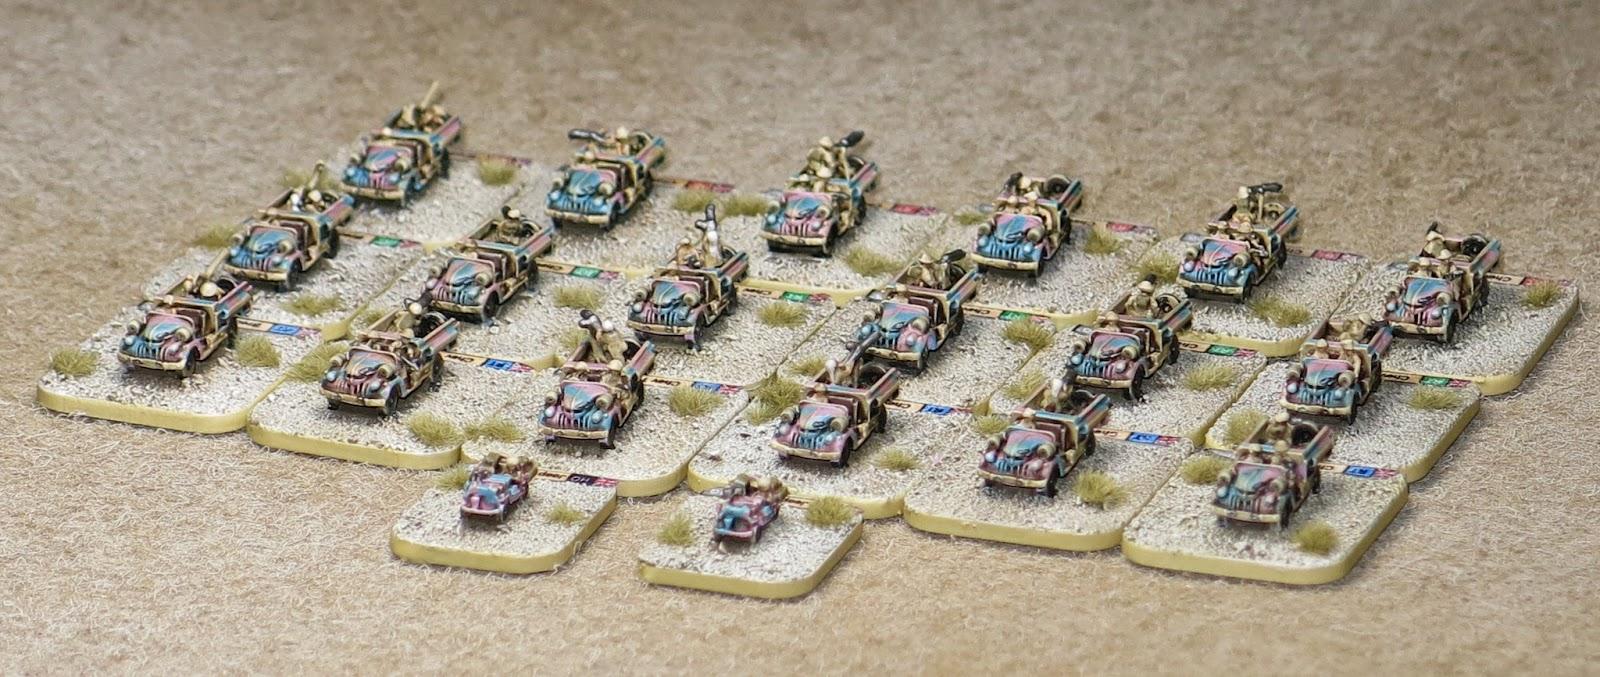 28mm Modern Wargames Roleplaying Militia Miniatures Andersen